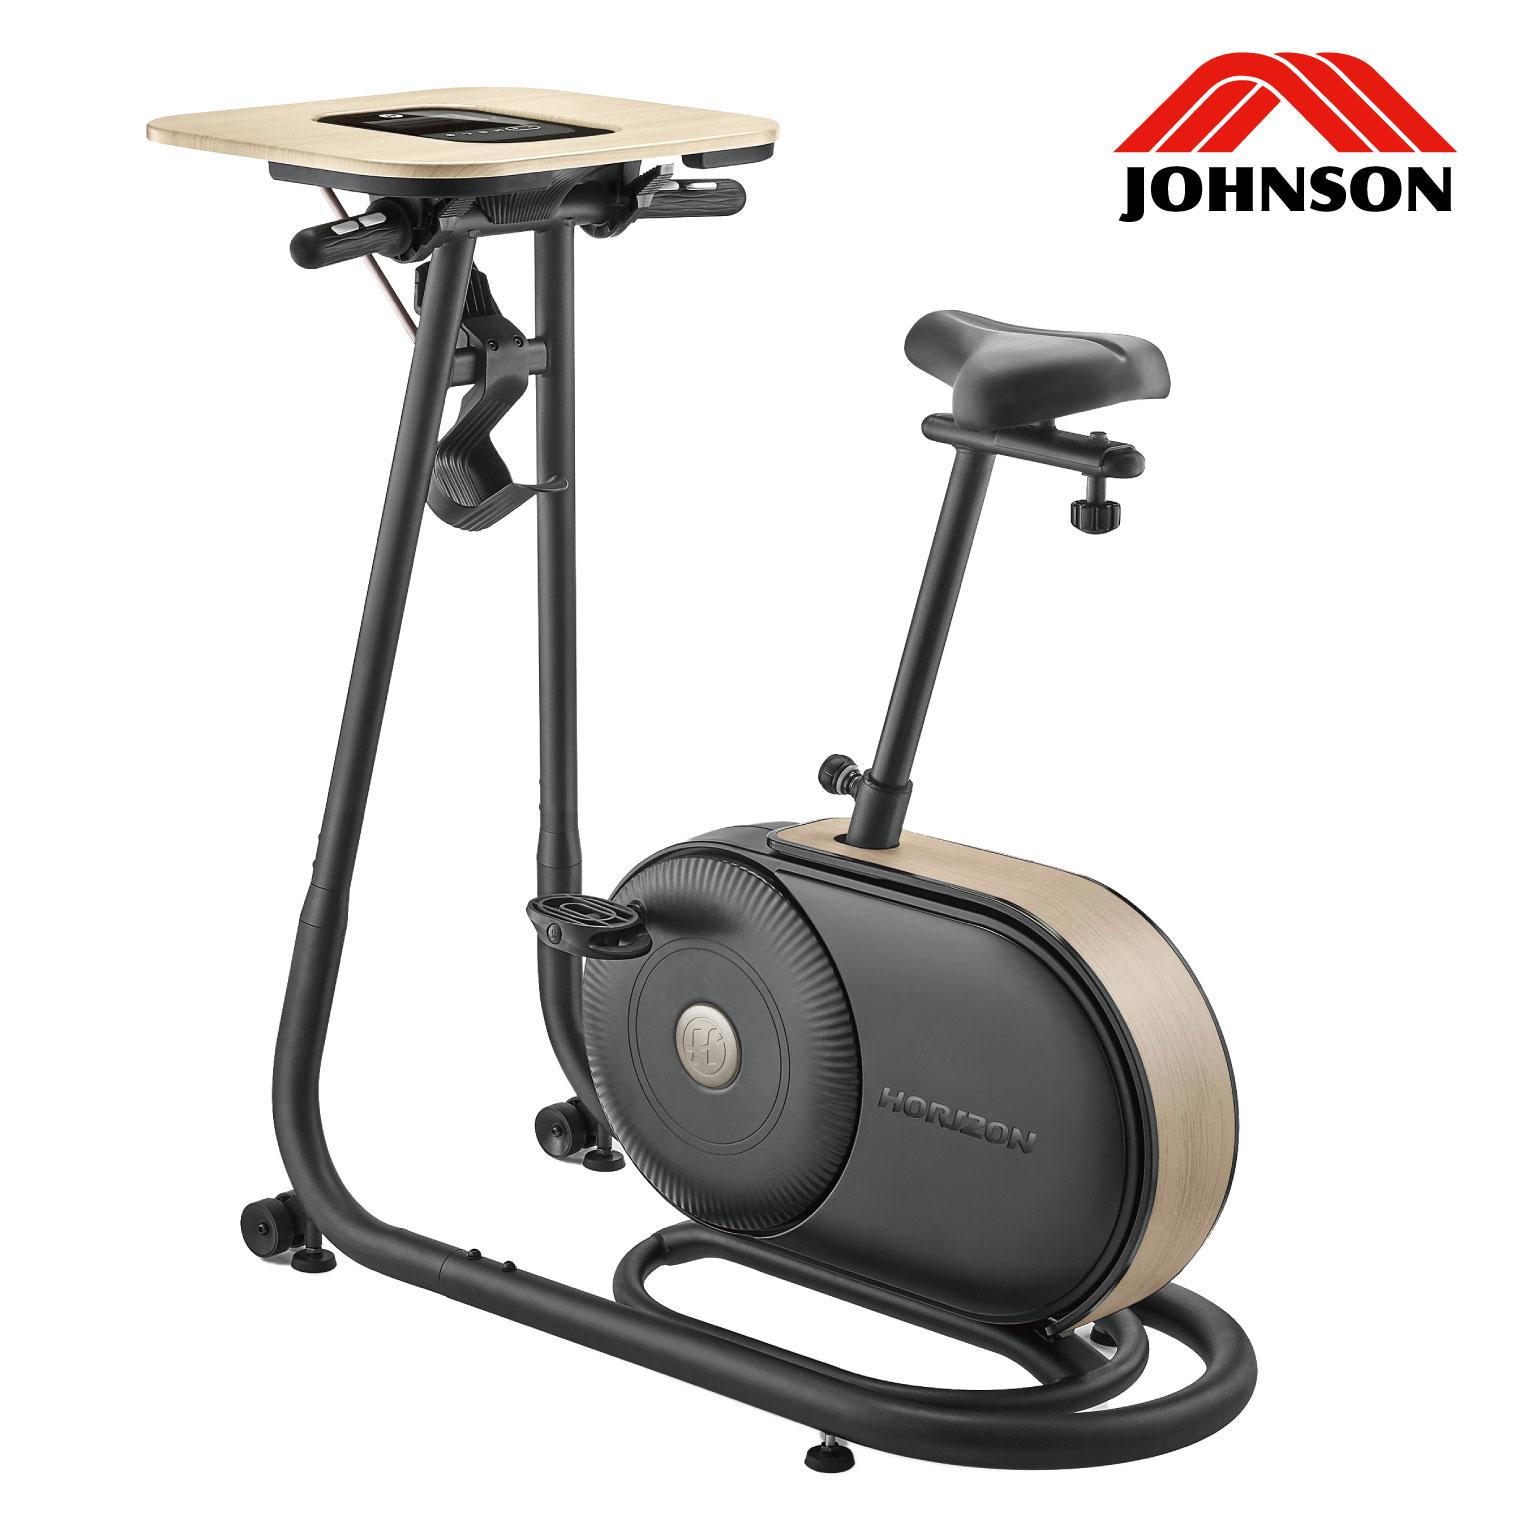 CittaBT5.0/家庭用アップライトバイク〈HORIZON〉《ジョンソンヘルステック》